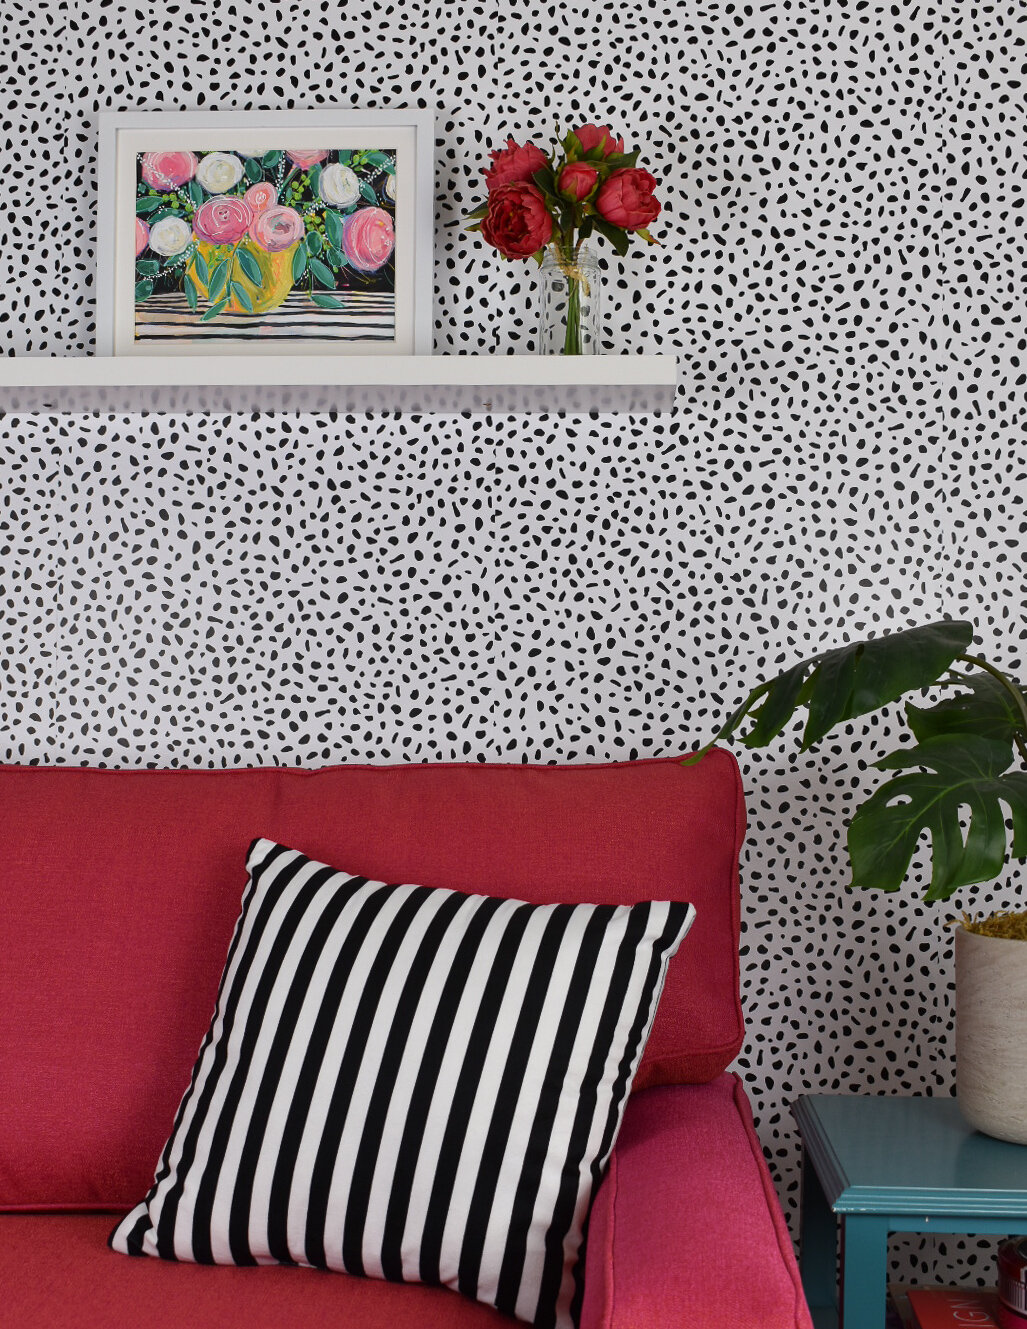 boho_eclectic_painting_art_stripes_daisyfaithart_pink_3.jpg